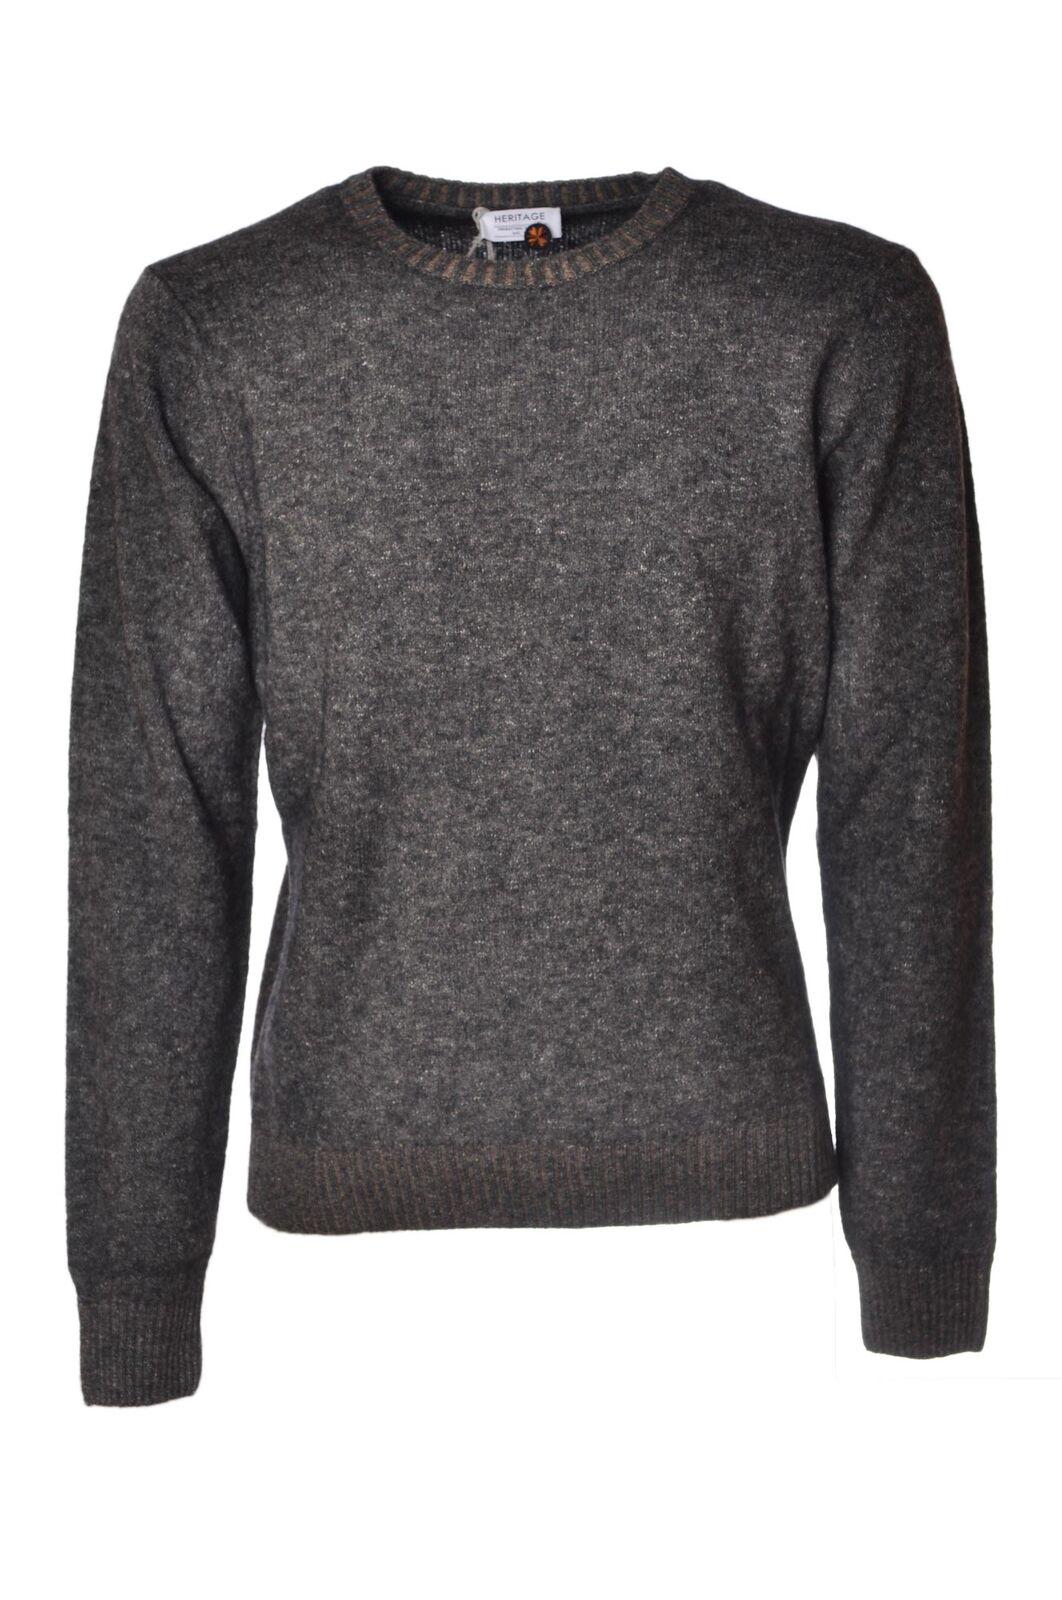 Heritage  -  Sweaters - Male - Grau - 4355926A184814